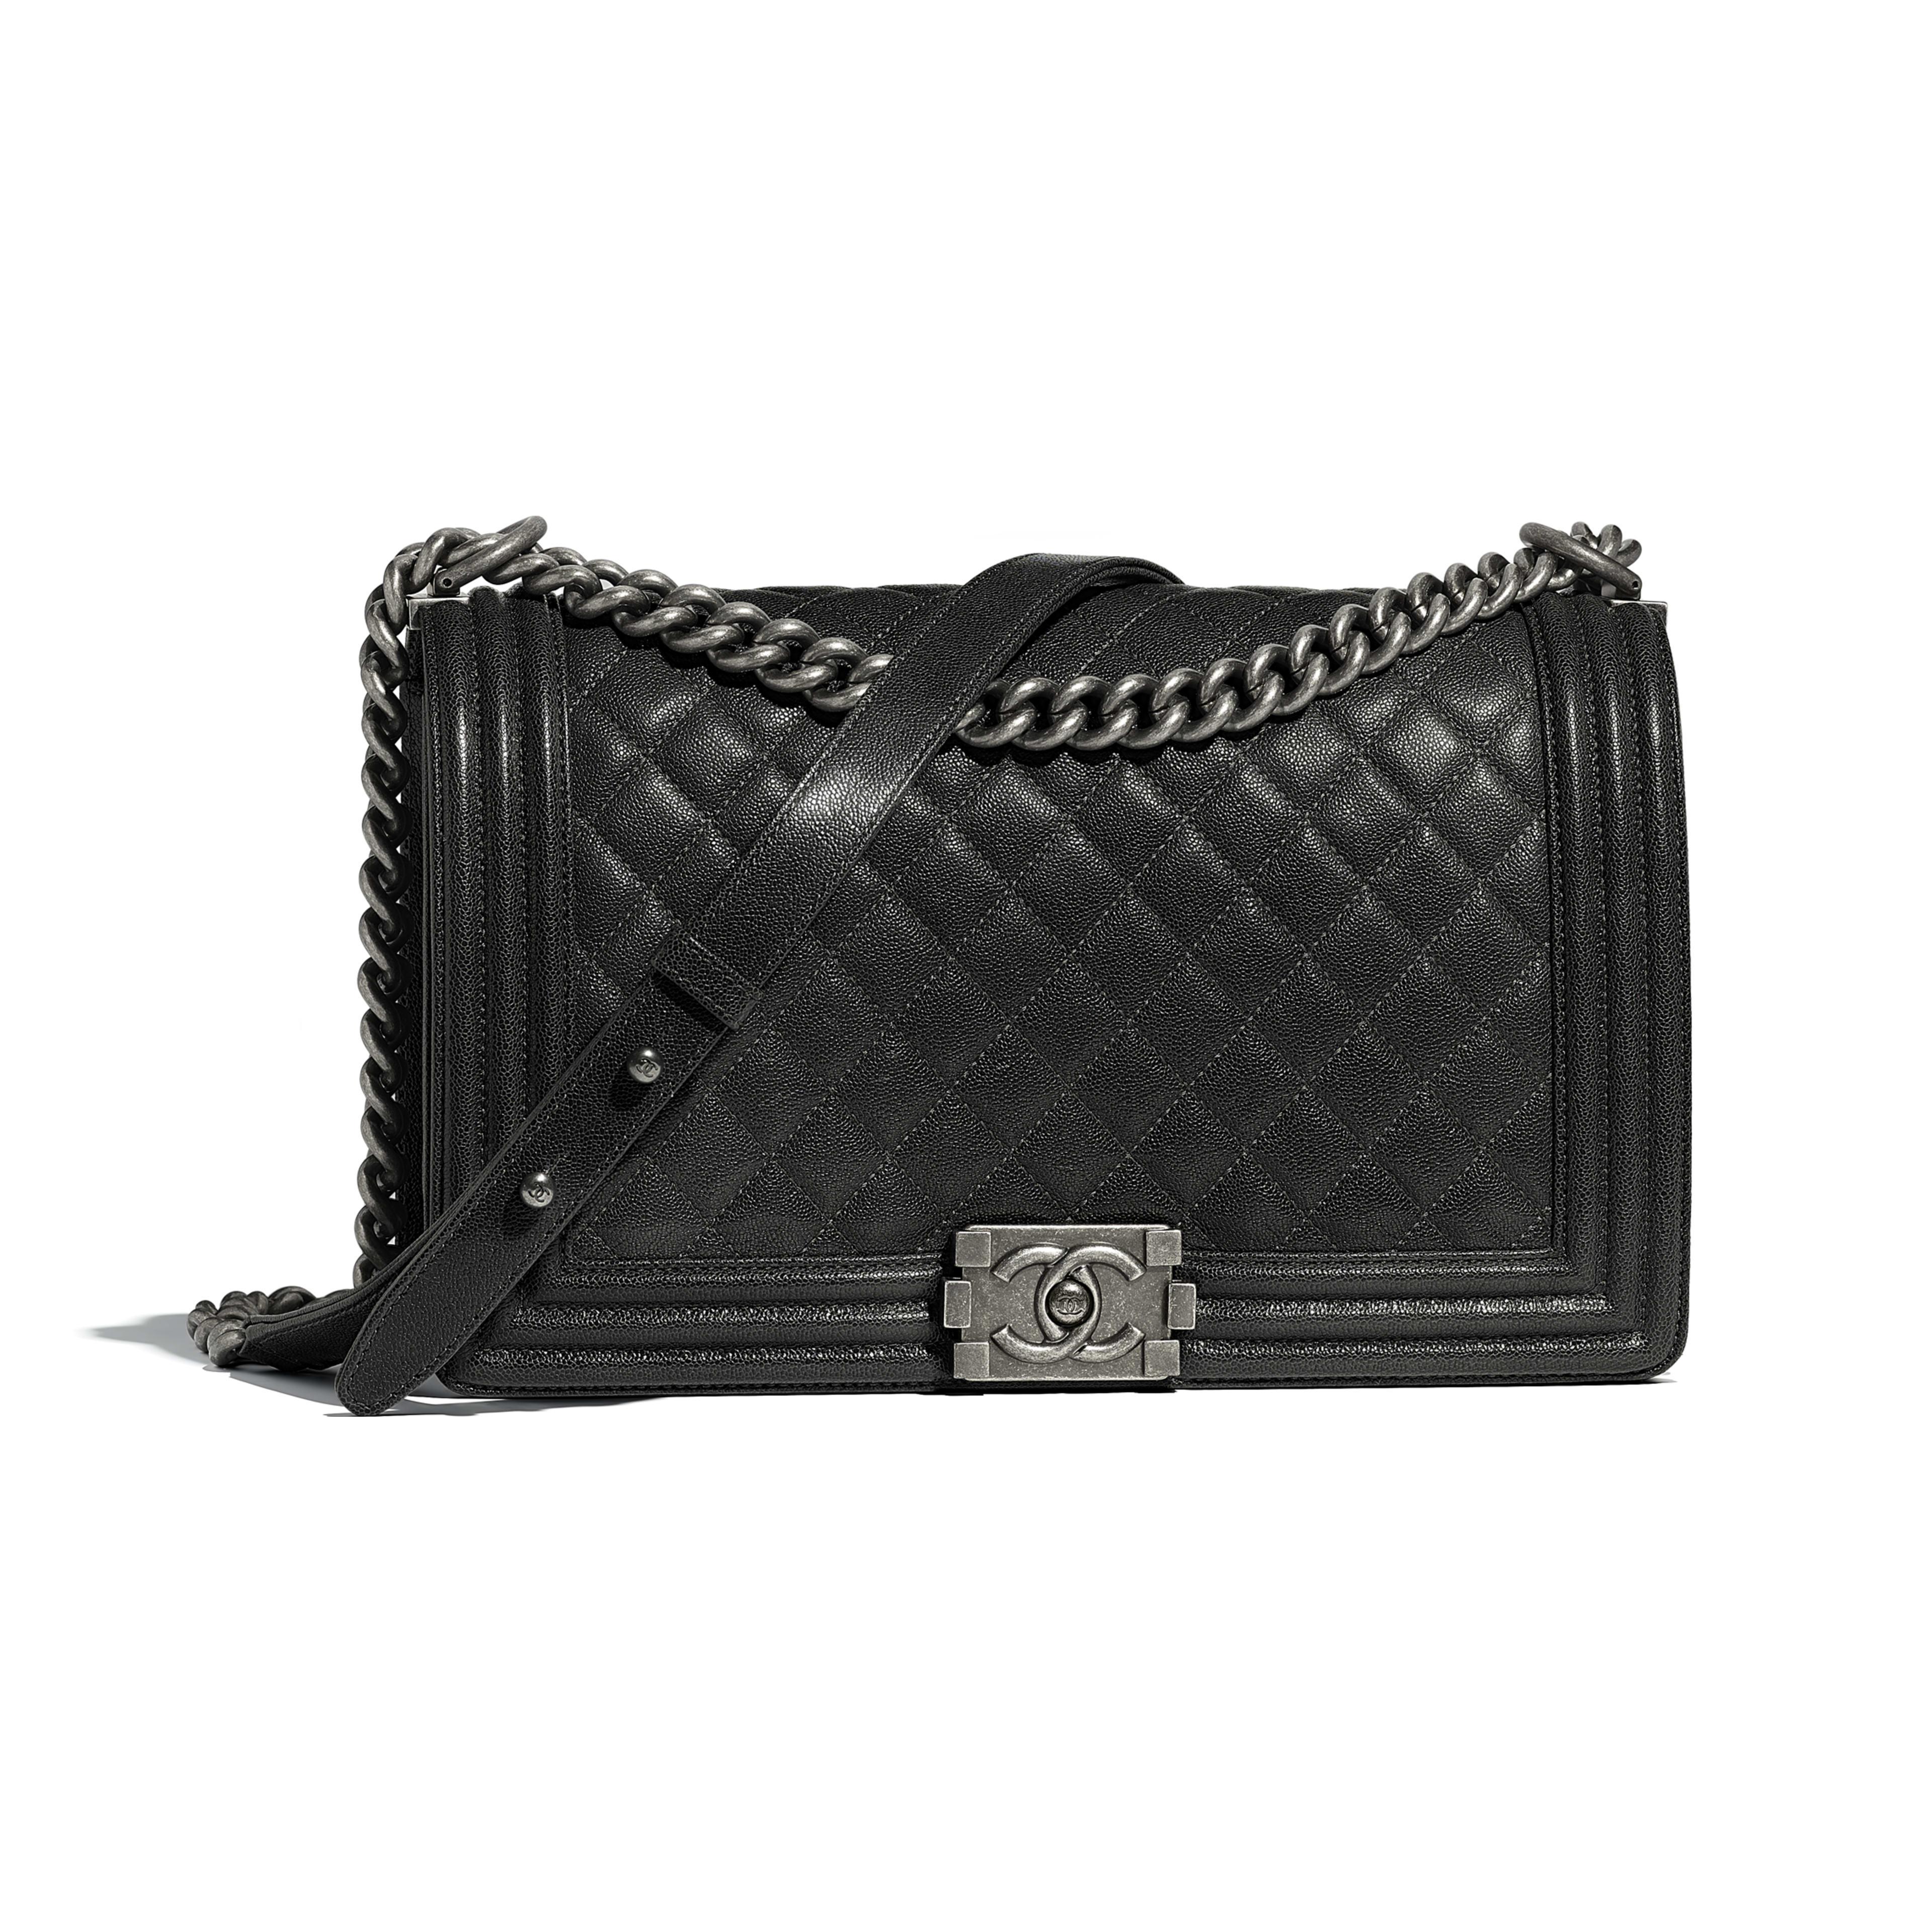 53cd8c3d227f Chanel Boy Chanel Handbag Calfskin & Ruthenium-finish Metal ...